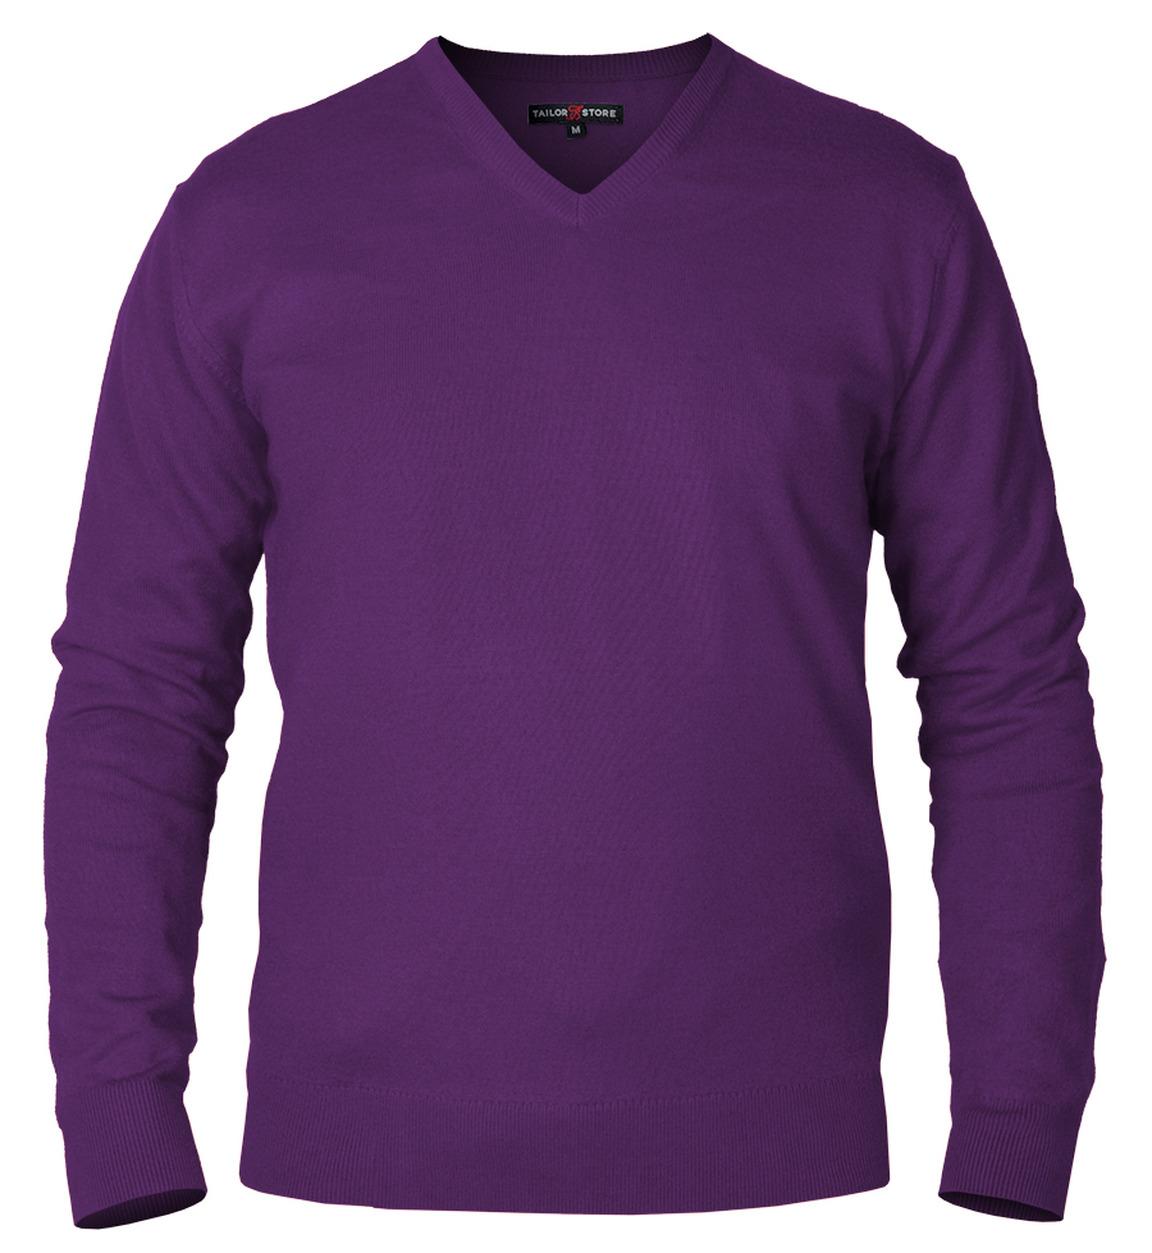 Windsor - Lila v-halsad tröja i pimabomull